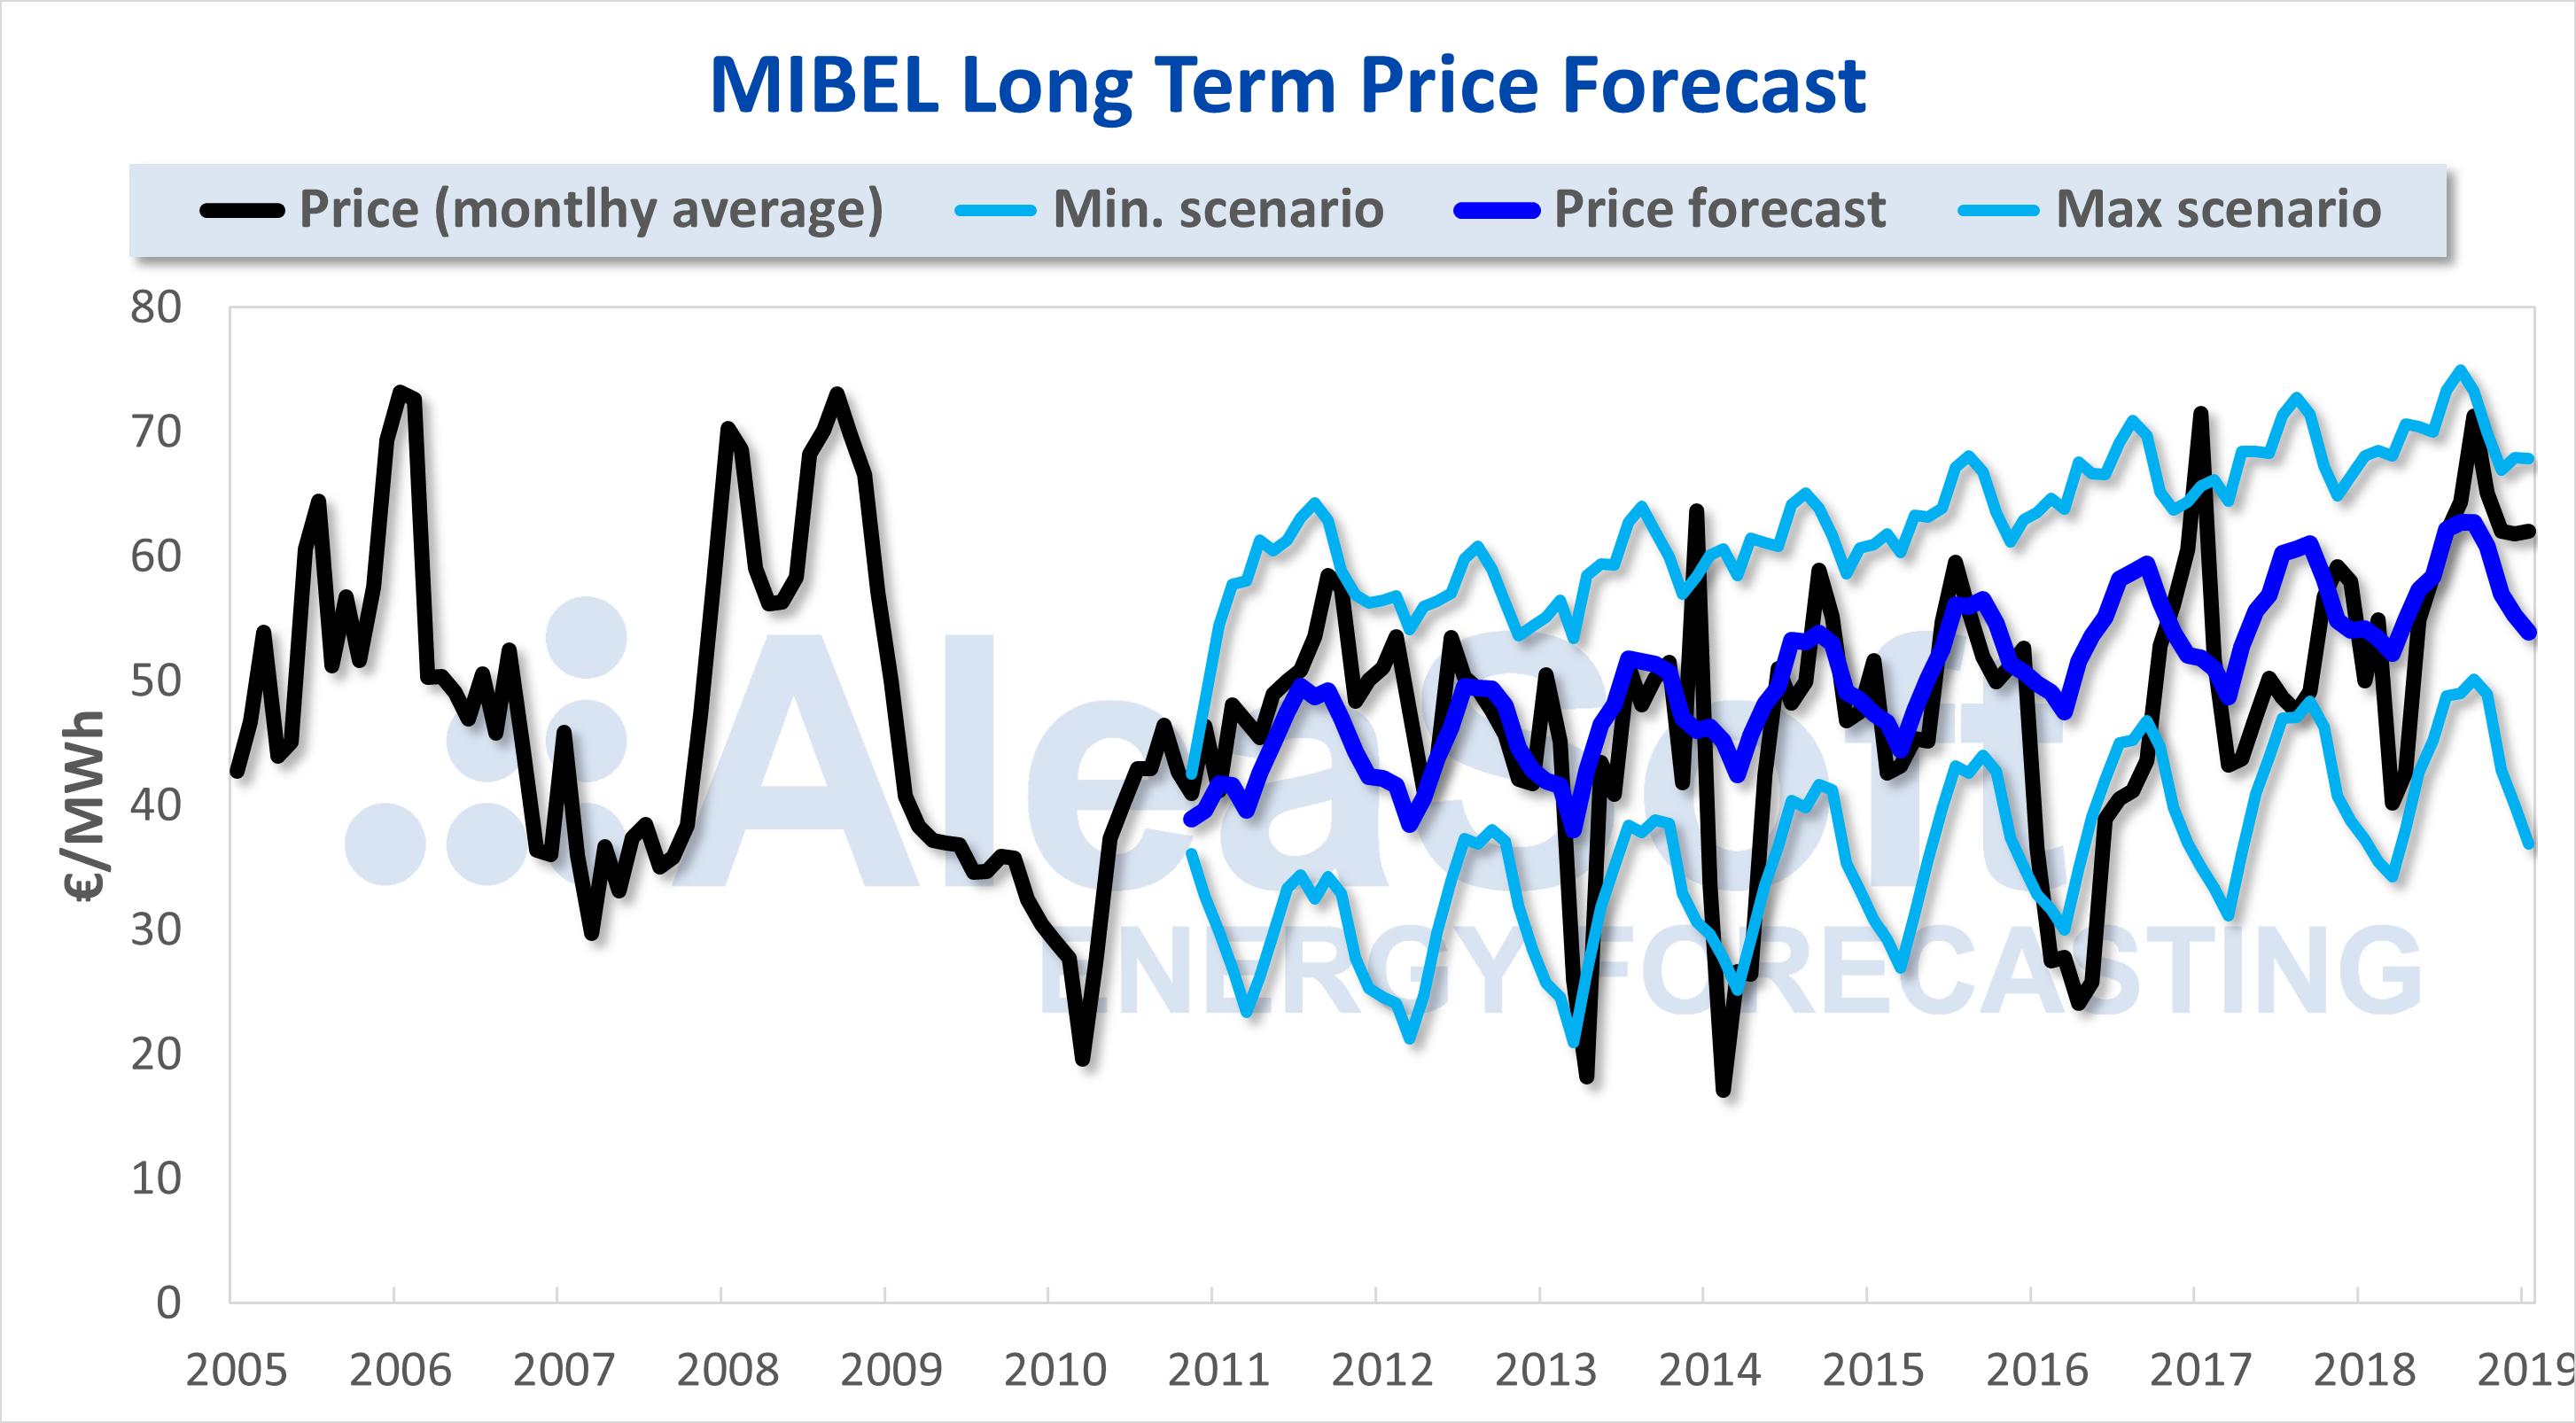 AleaSoft - MIBEL Long Term Price Forecast